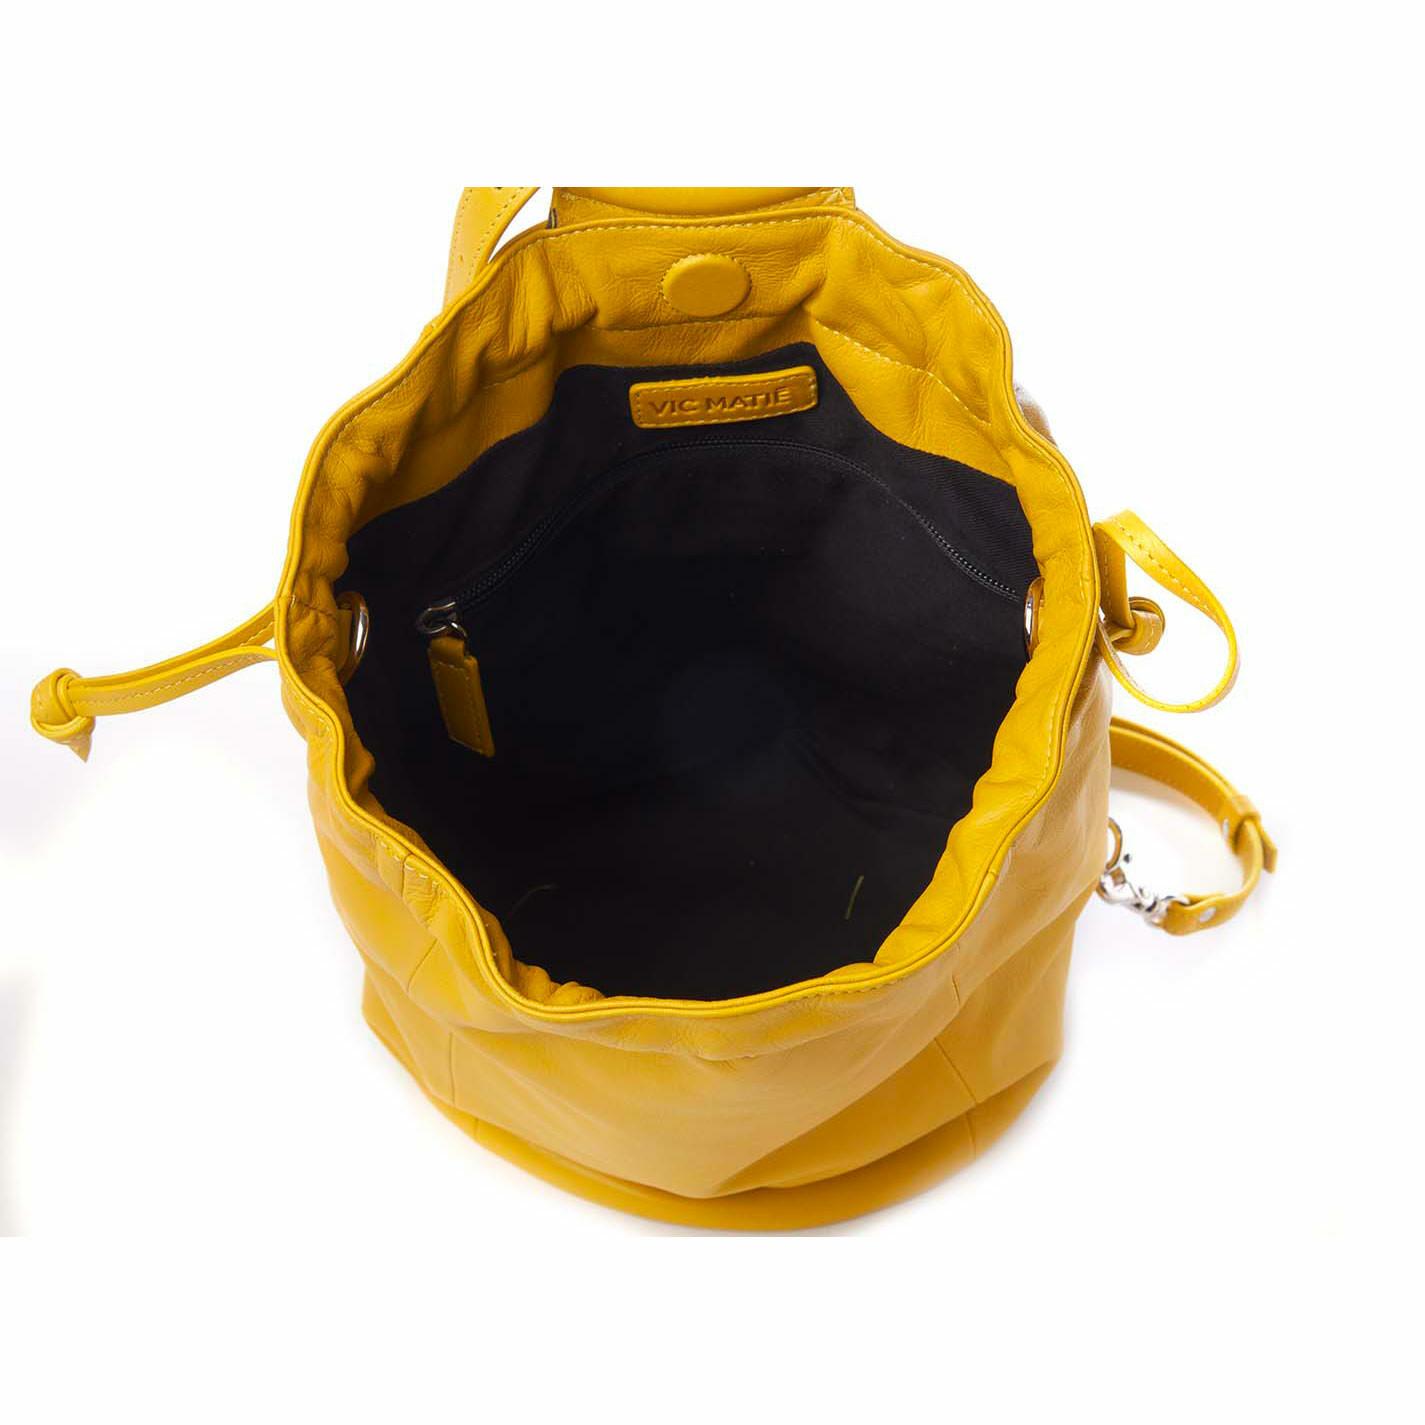 Tecla<br />Ochre-yellow leather bucket bag